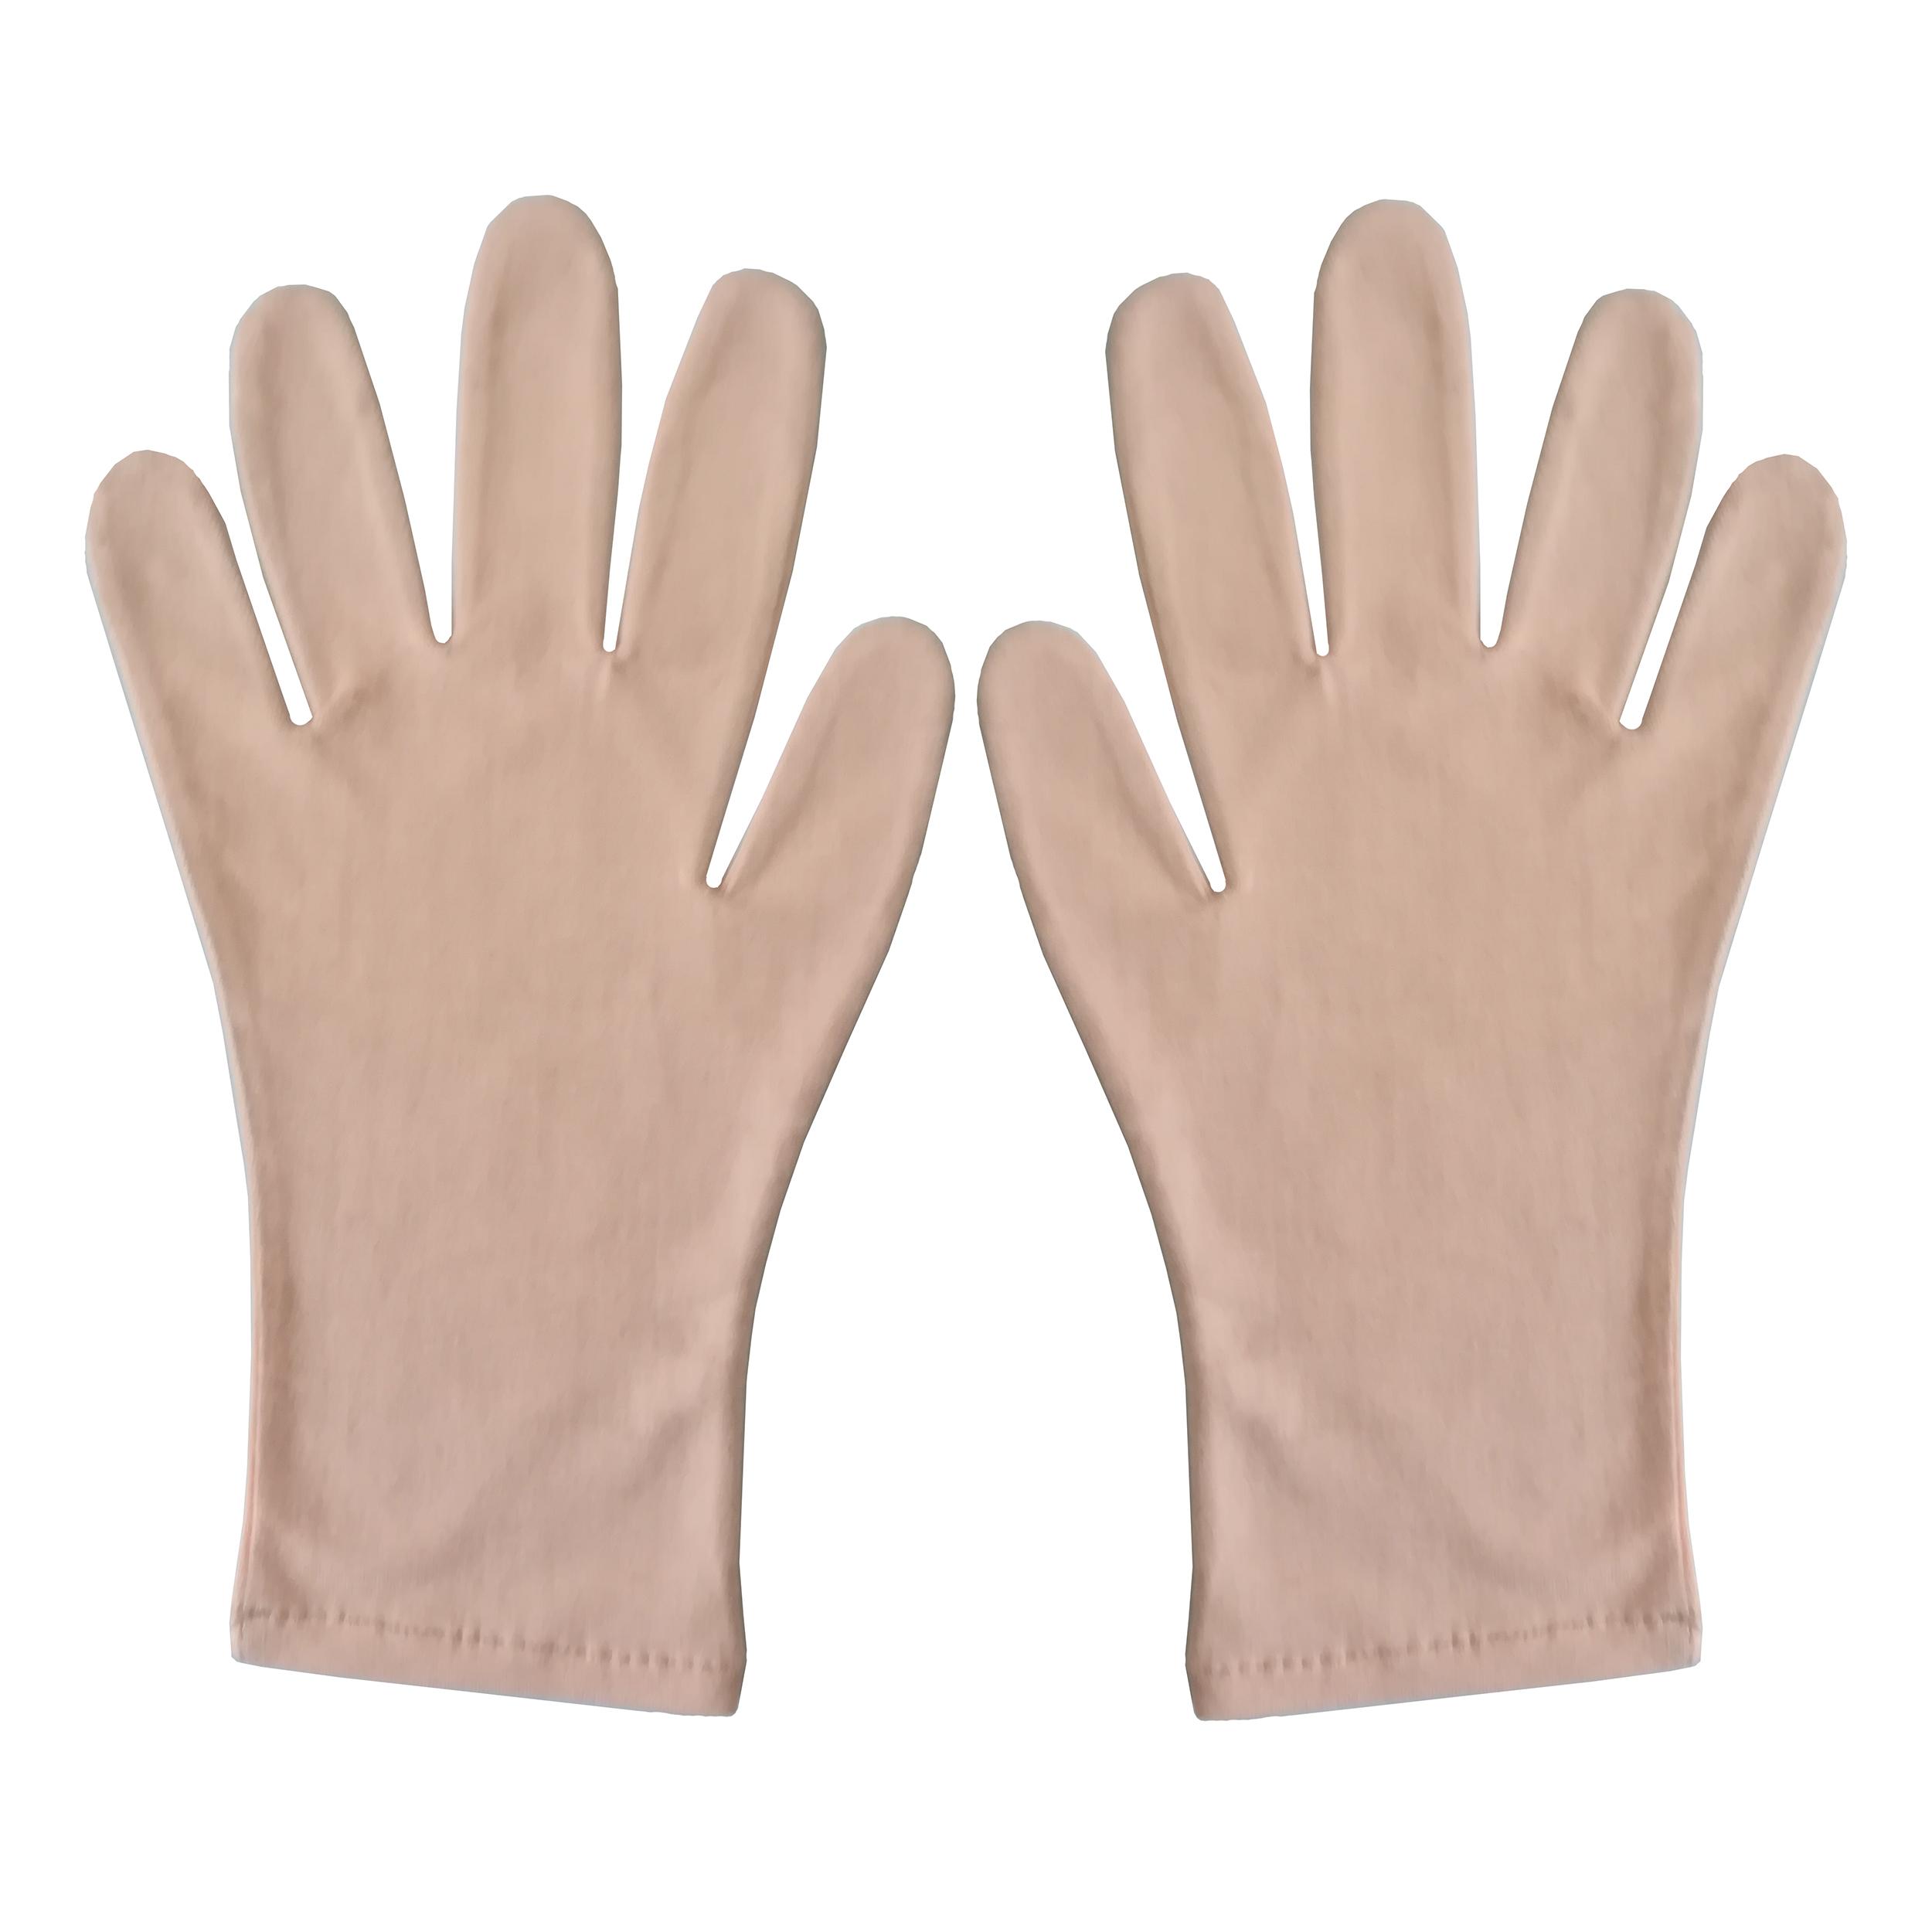 دستکش زنانه دالیا مدل F1 thumb